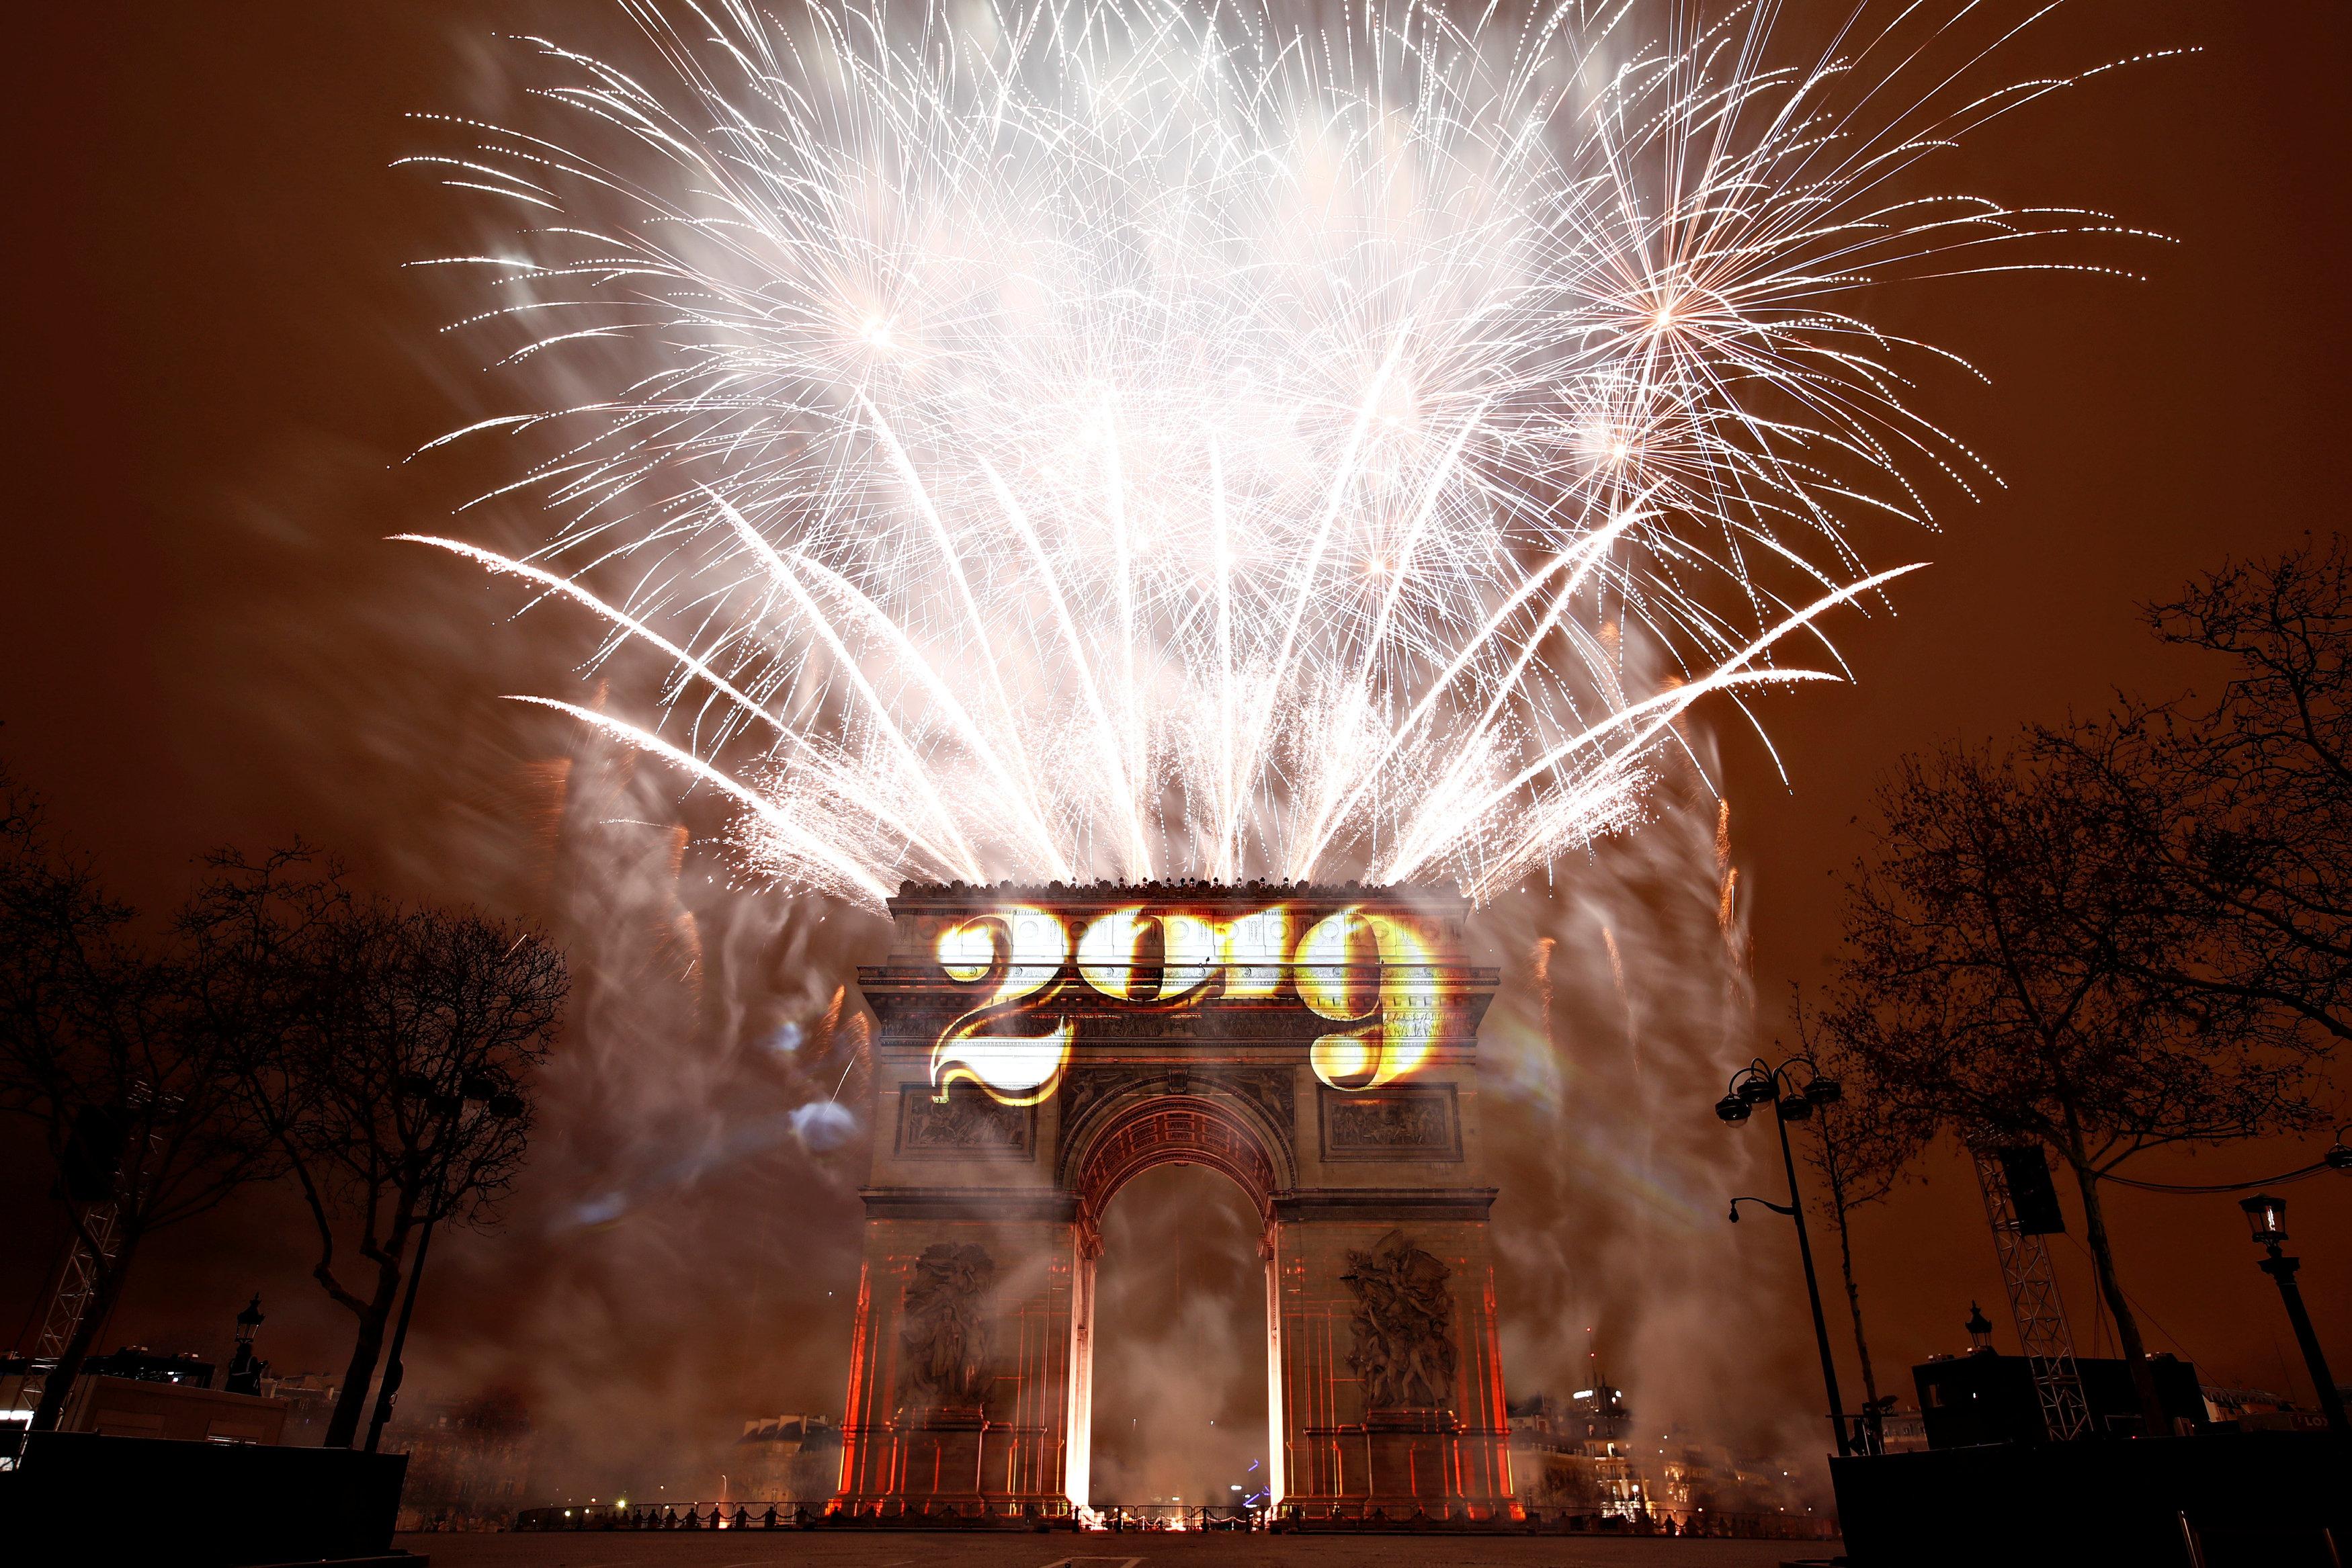 فرنسا تحتفل بـ2019